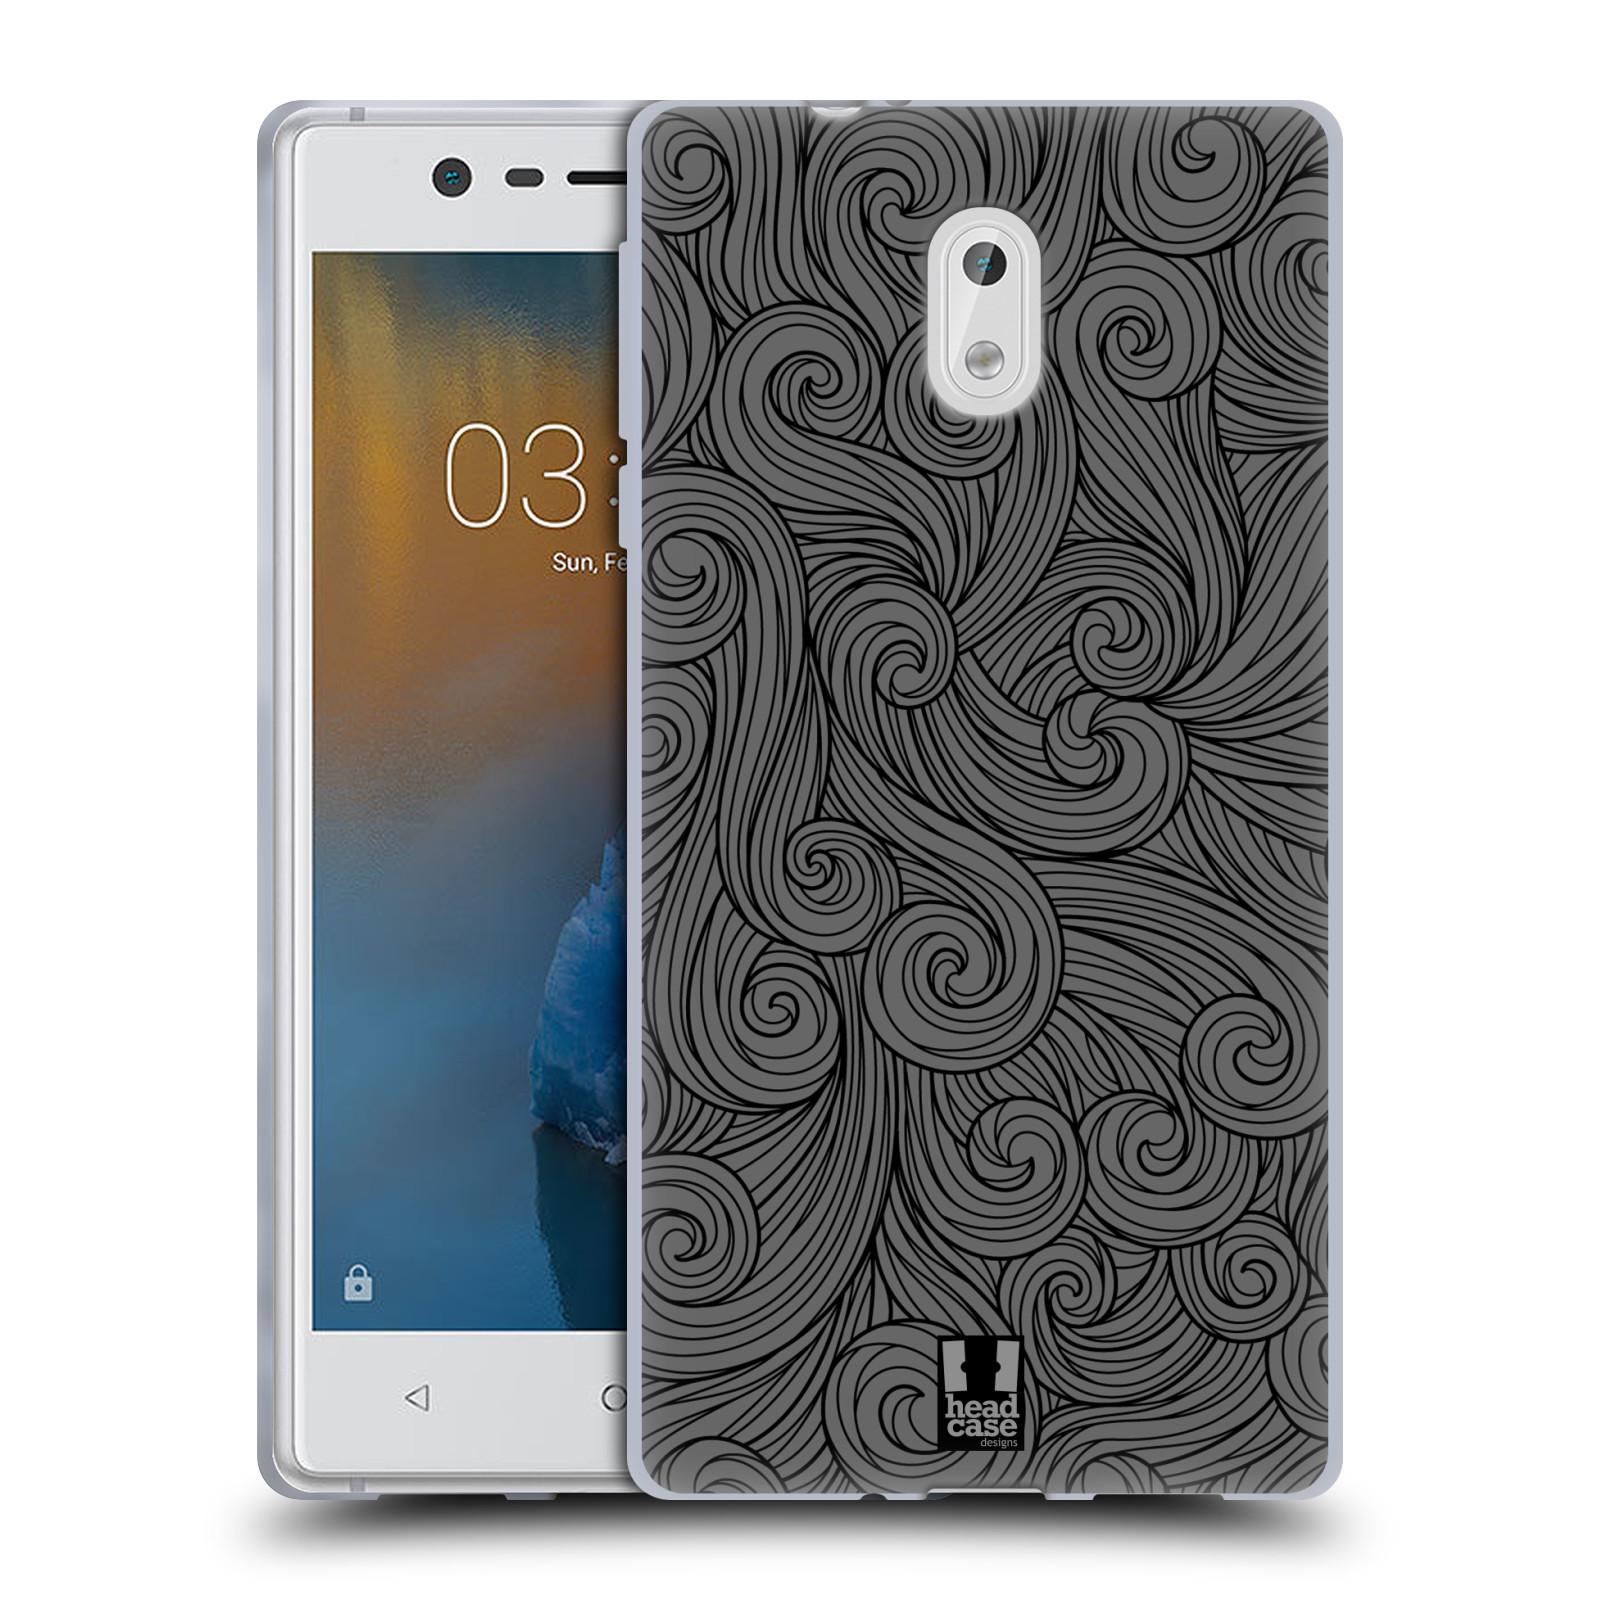 Silikonové pouzdro na mobil Nokia 3 Head Case - Dark Grey Swirls (Silikonový kryt či obal na mobilní telefon Nokia 3 (2017))